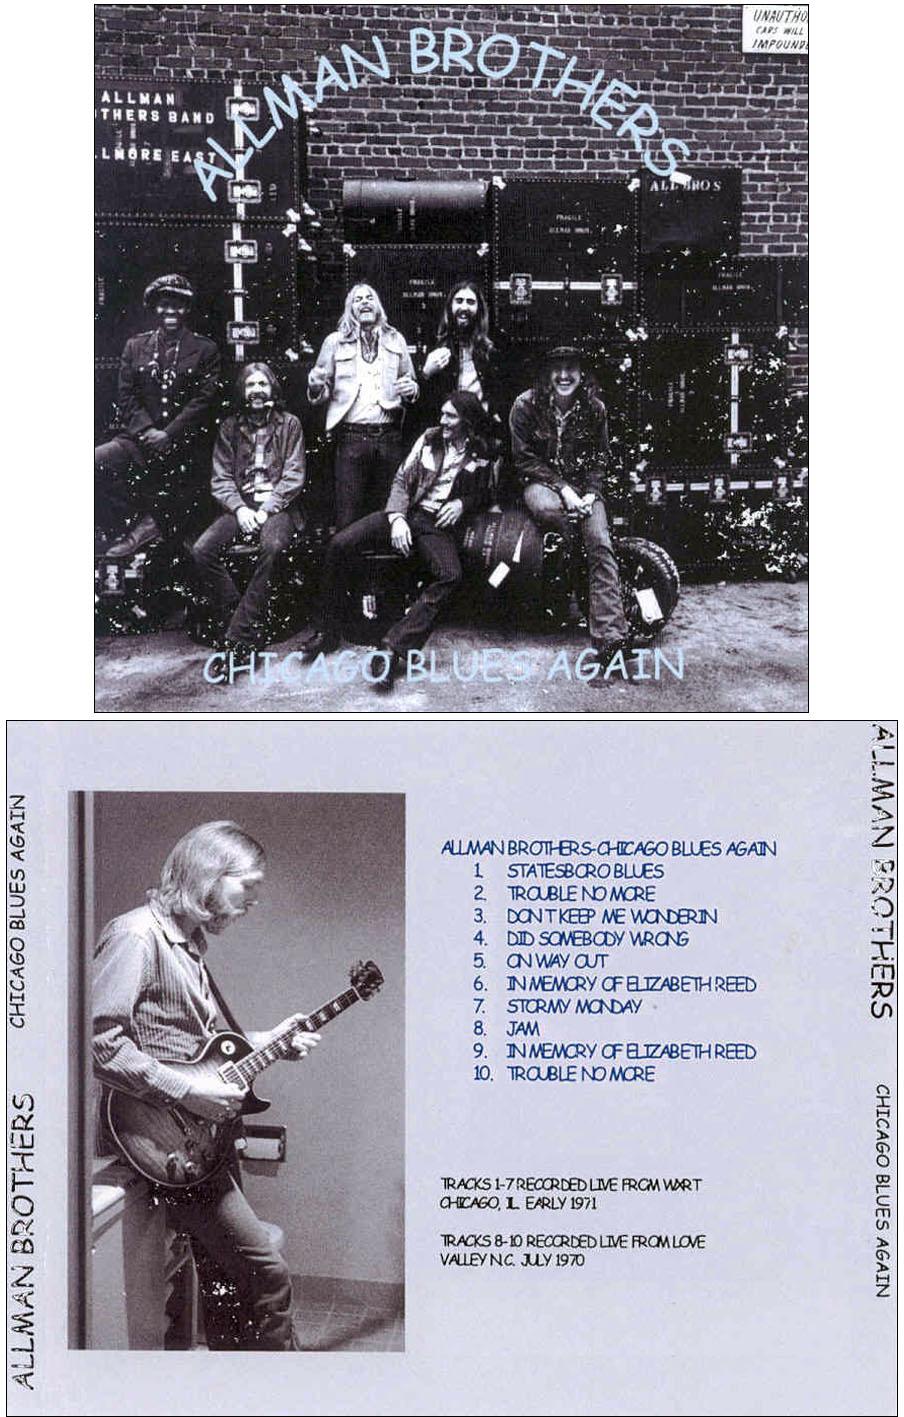 AllmanBrothersBand1971WXRTChicagoIL.jpg